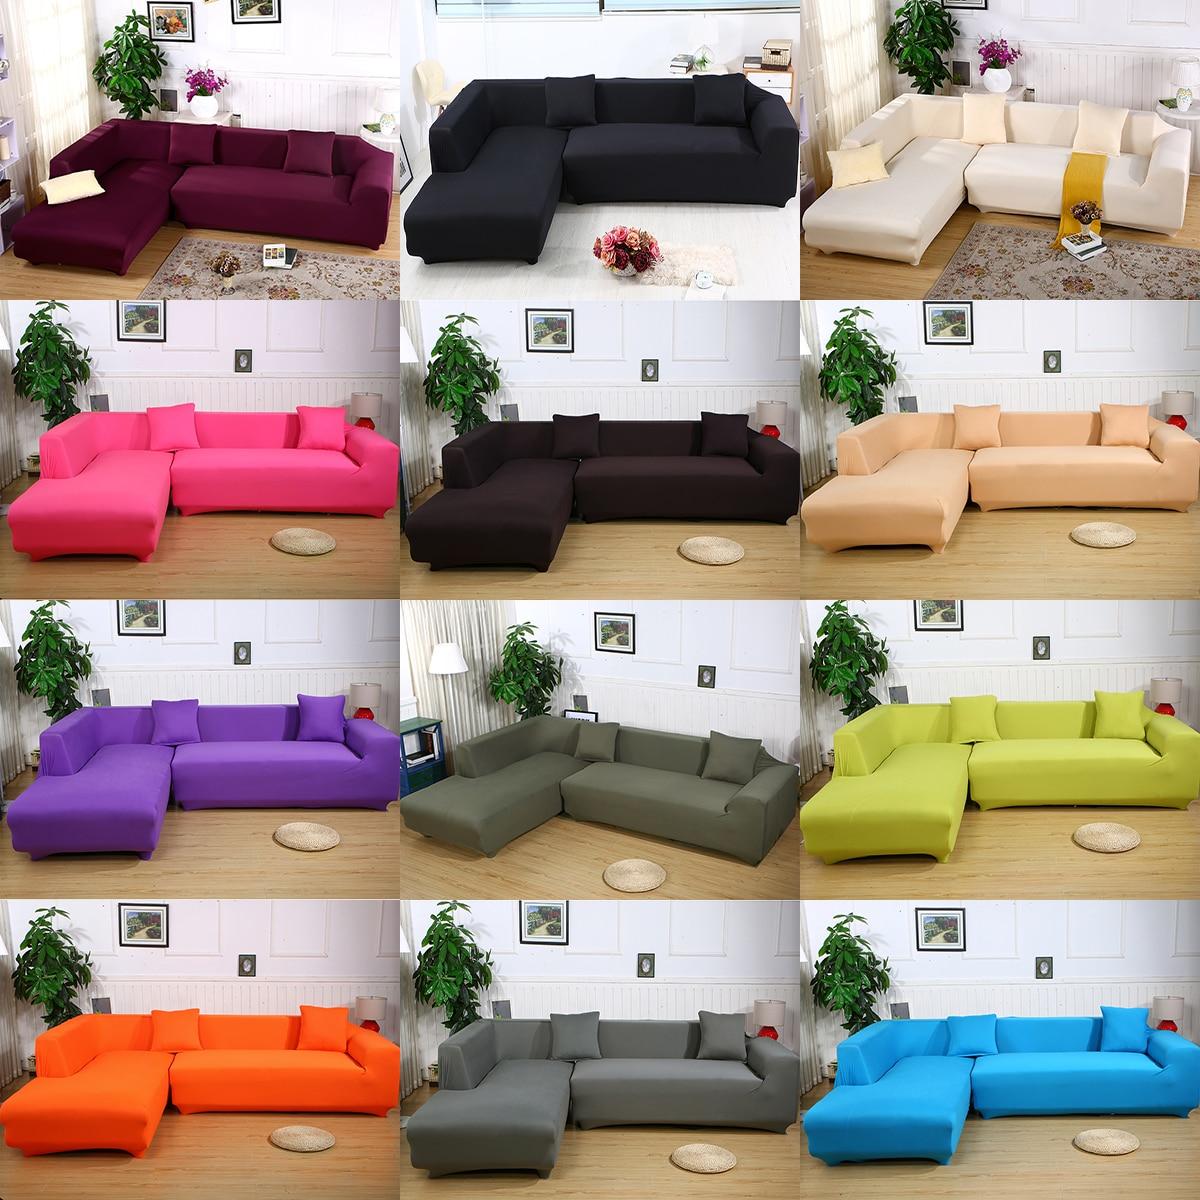 4 Seater Elastic Sofa Cover Tight Wrap All inclusive Slip resistant ...